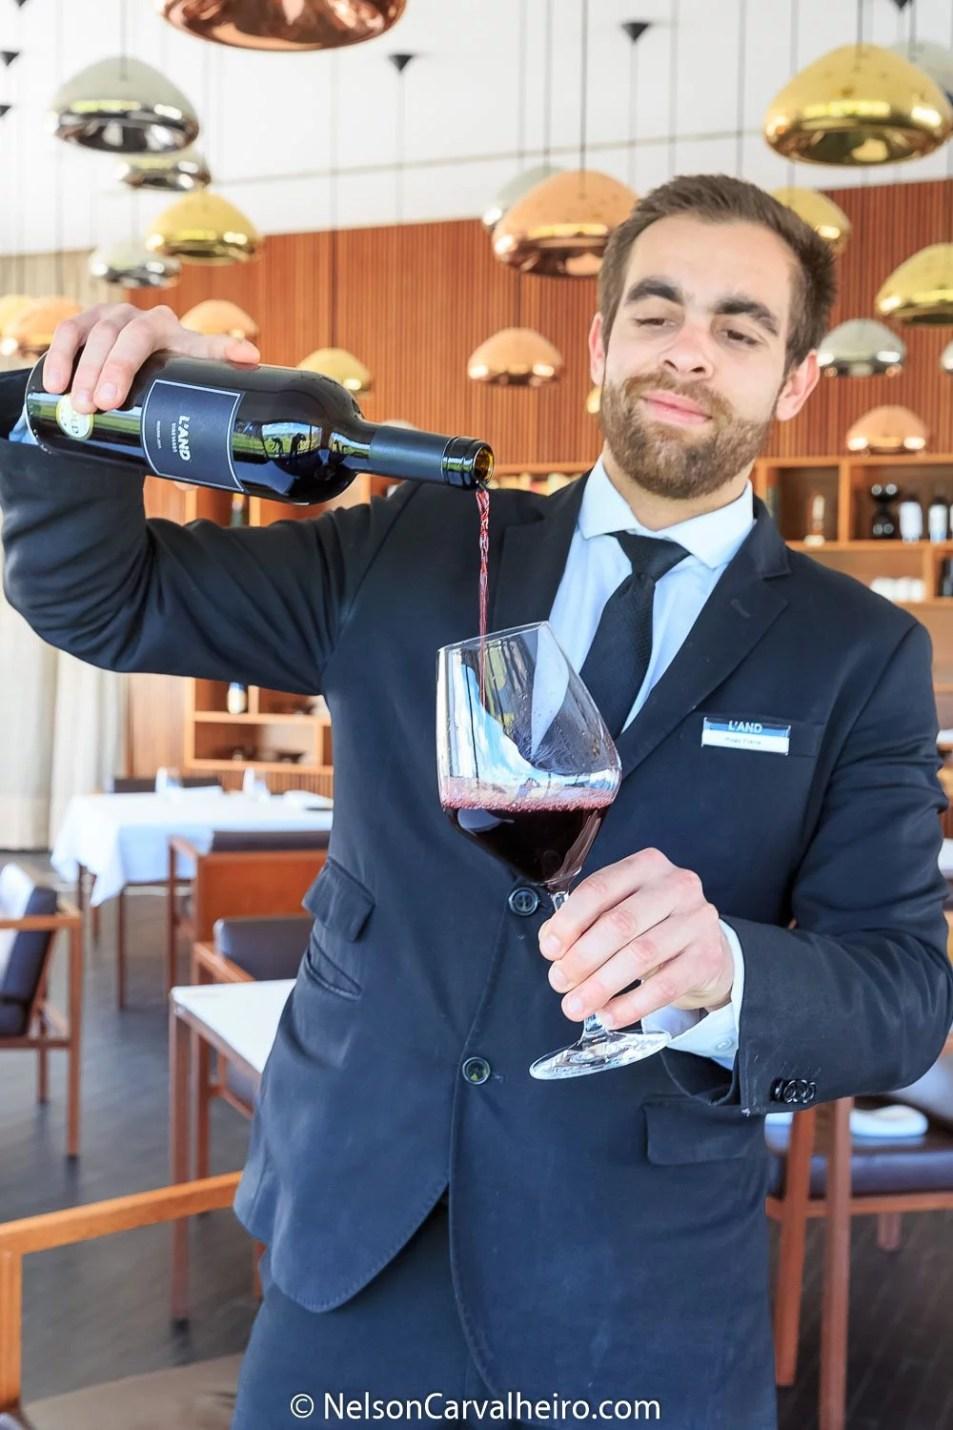 Nelson_Carvalheiro_Alentejo_Wine_Travel_Guide_L'AND-18